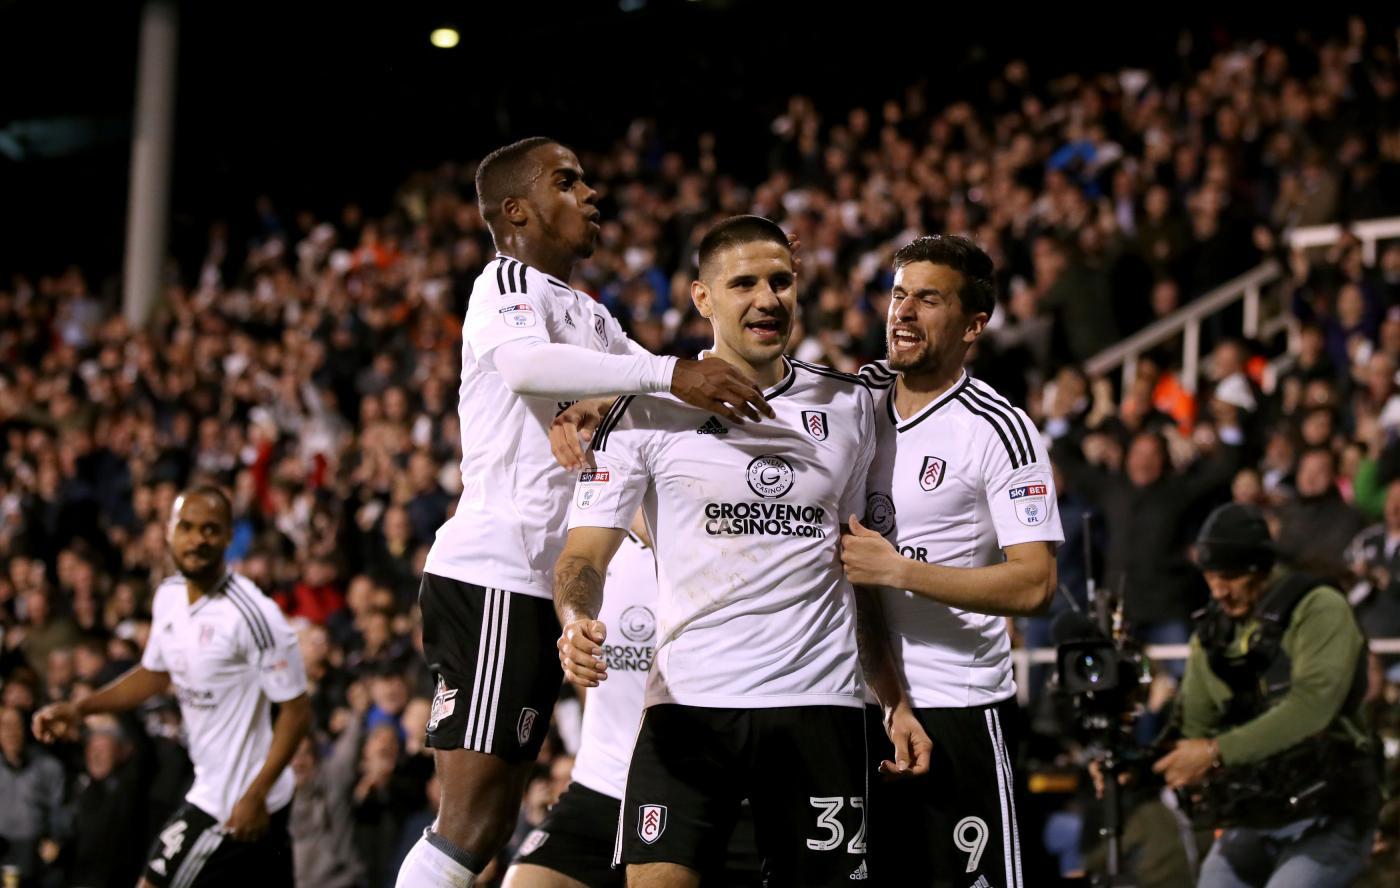 Pronostico Fulham-Middlesbrough 17 gennaio: le quote di Championship